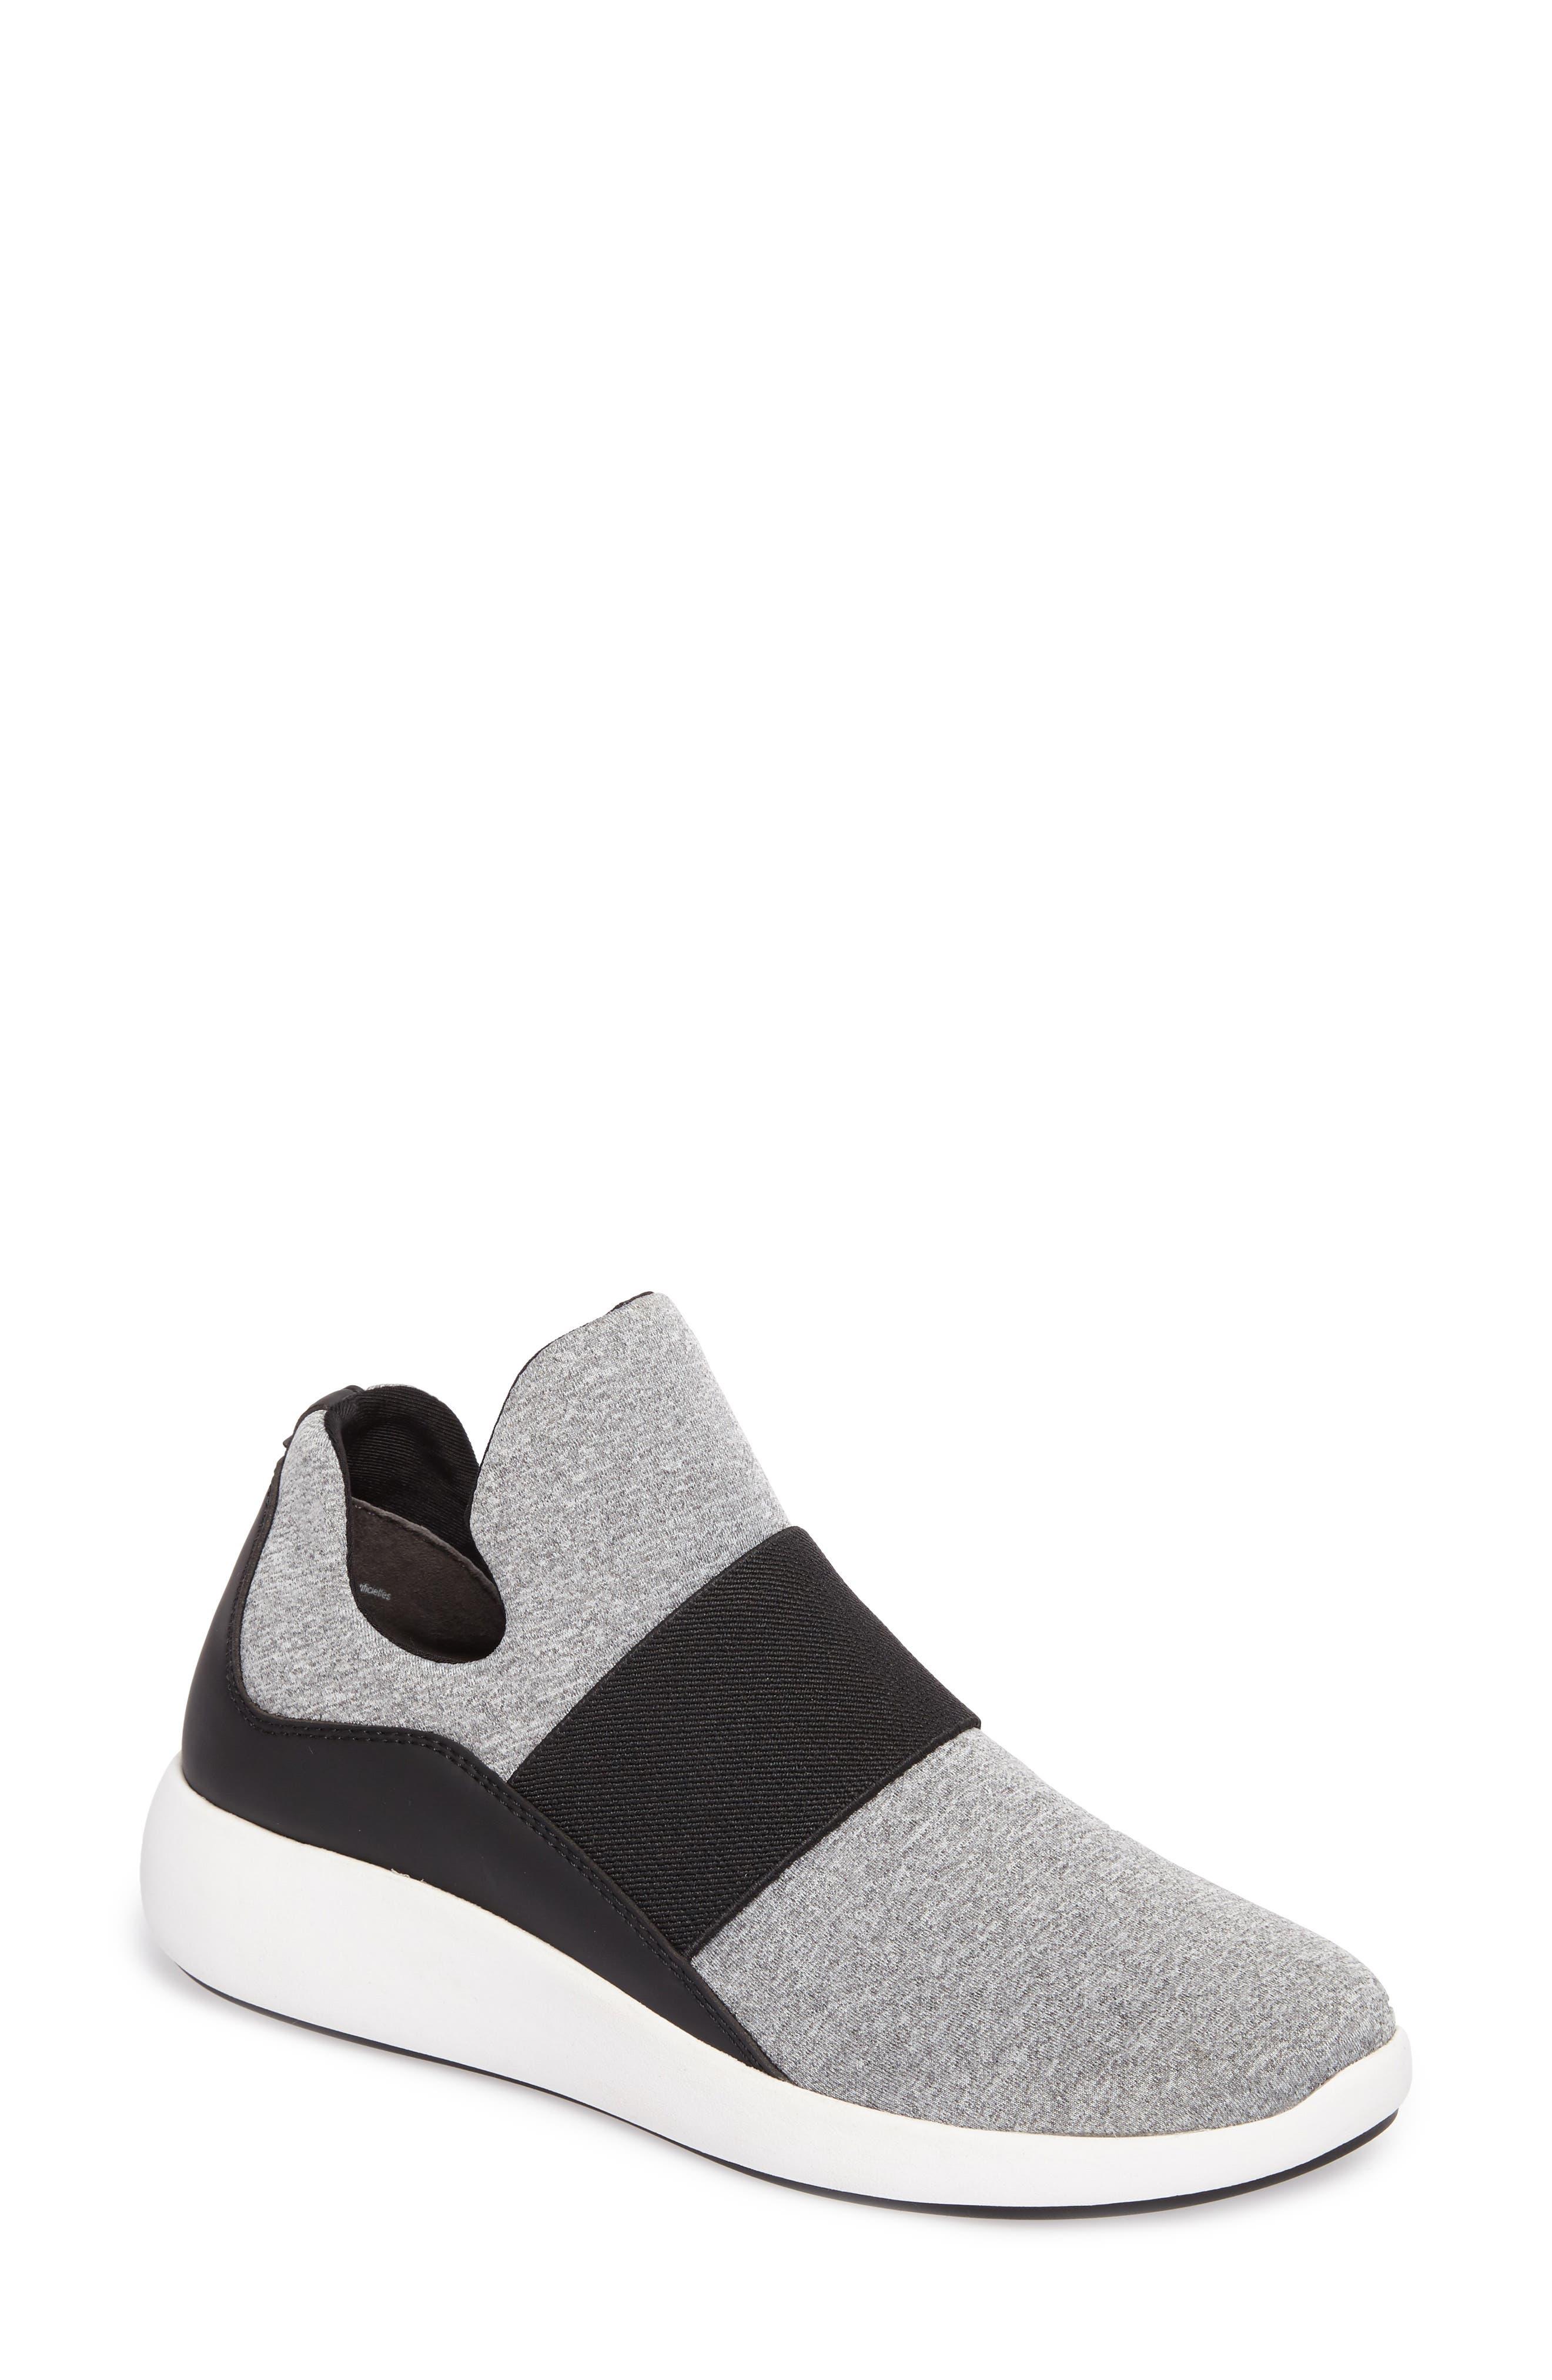 Donna Karan Cory Slip-On Sneaker,                             Main thumbnail 1, color,                             Light Pearl/ Black